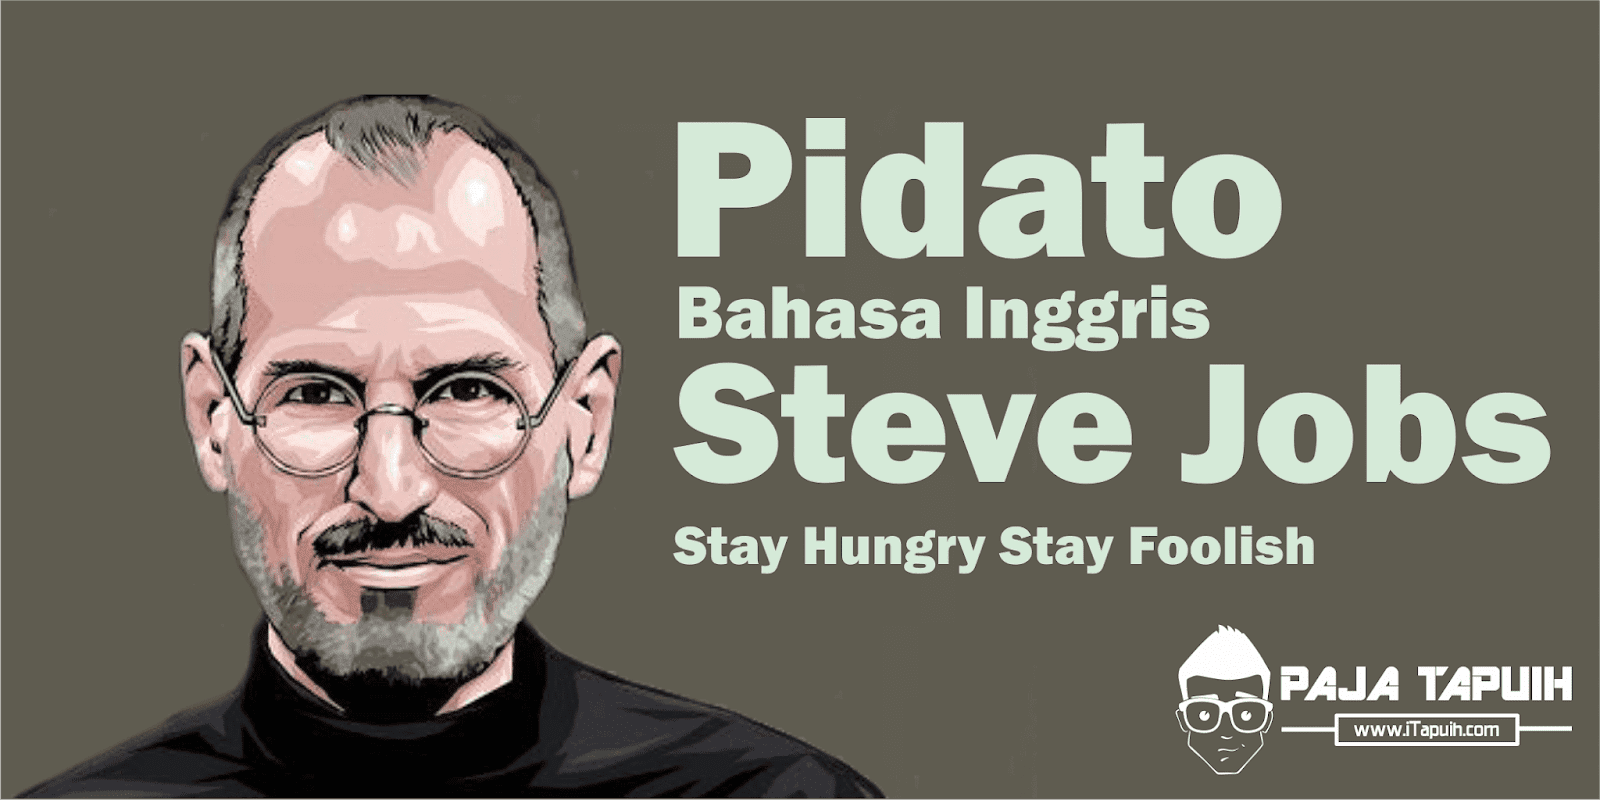 pidato bahasa inggris steve jobs stay hungry stay foolish dan